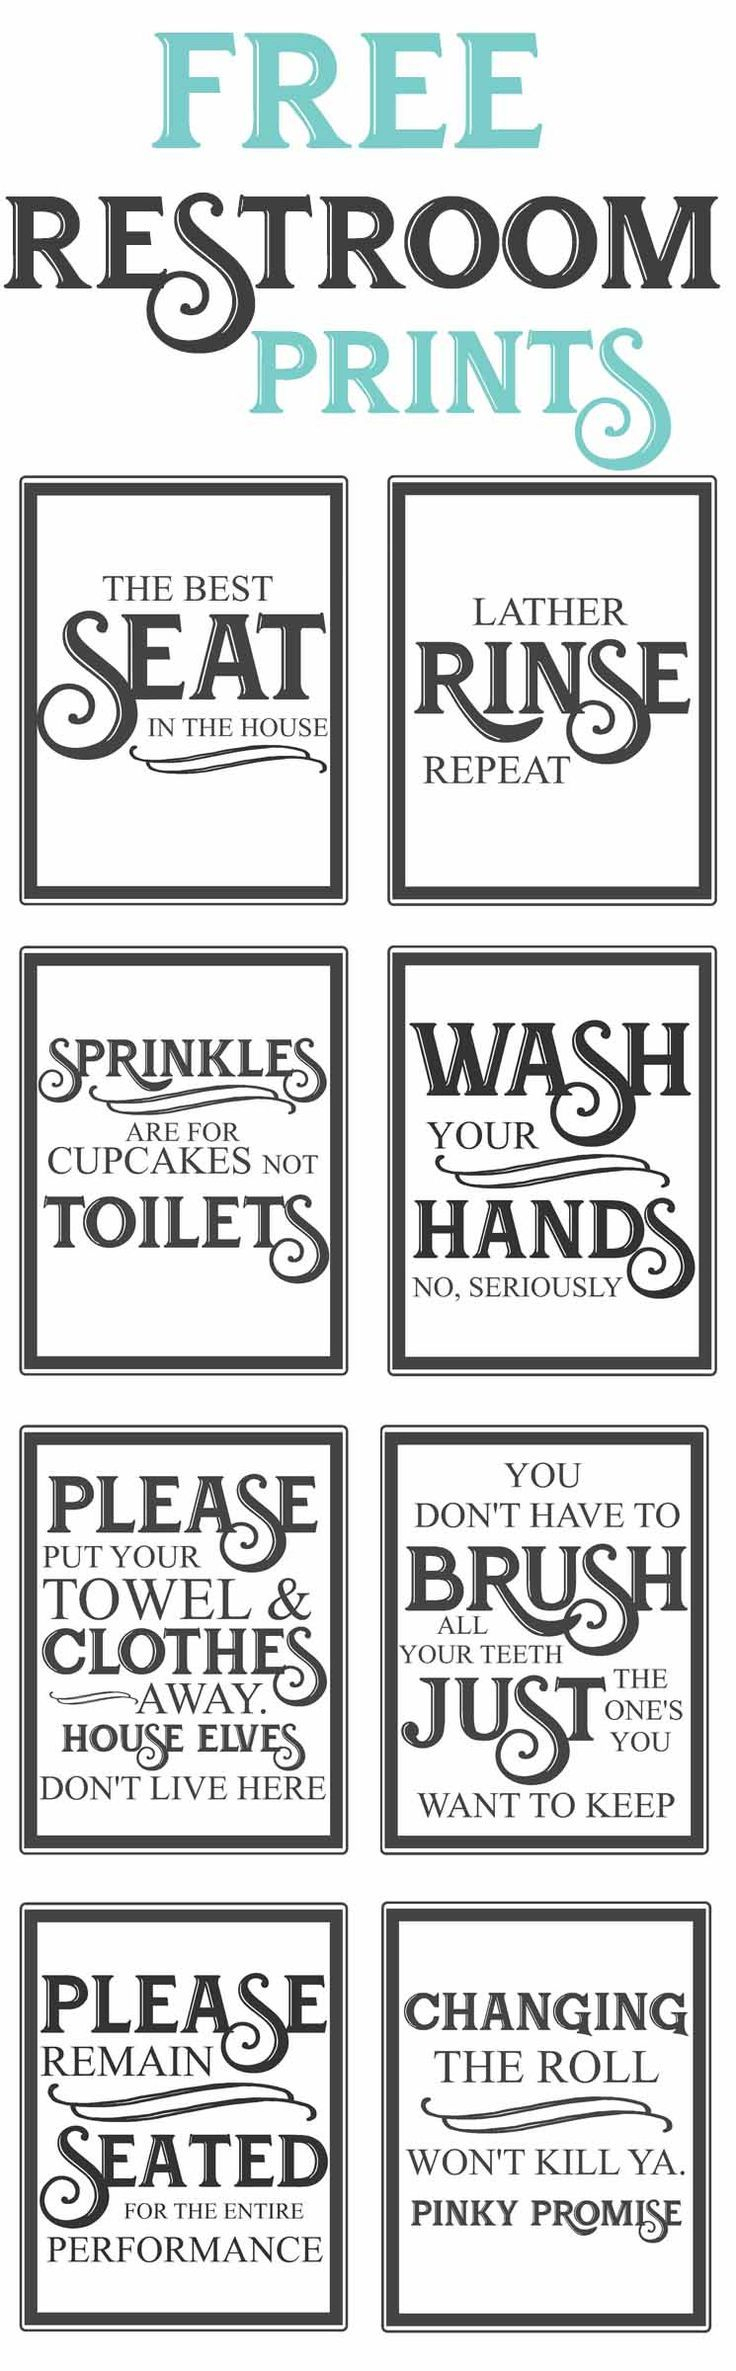 Free Vintage Bathroom Printables   Farmhouse   Diy Home Decor, Home - Free Printable Bathroom Signs